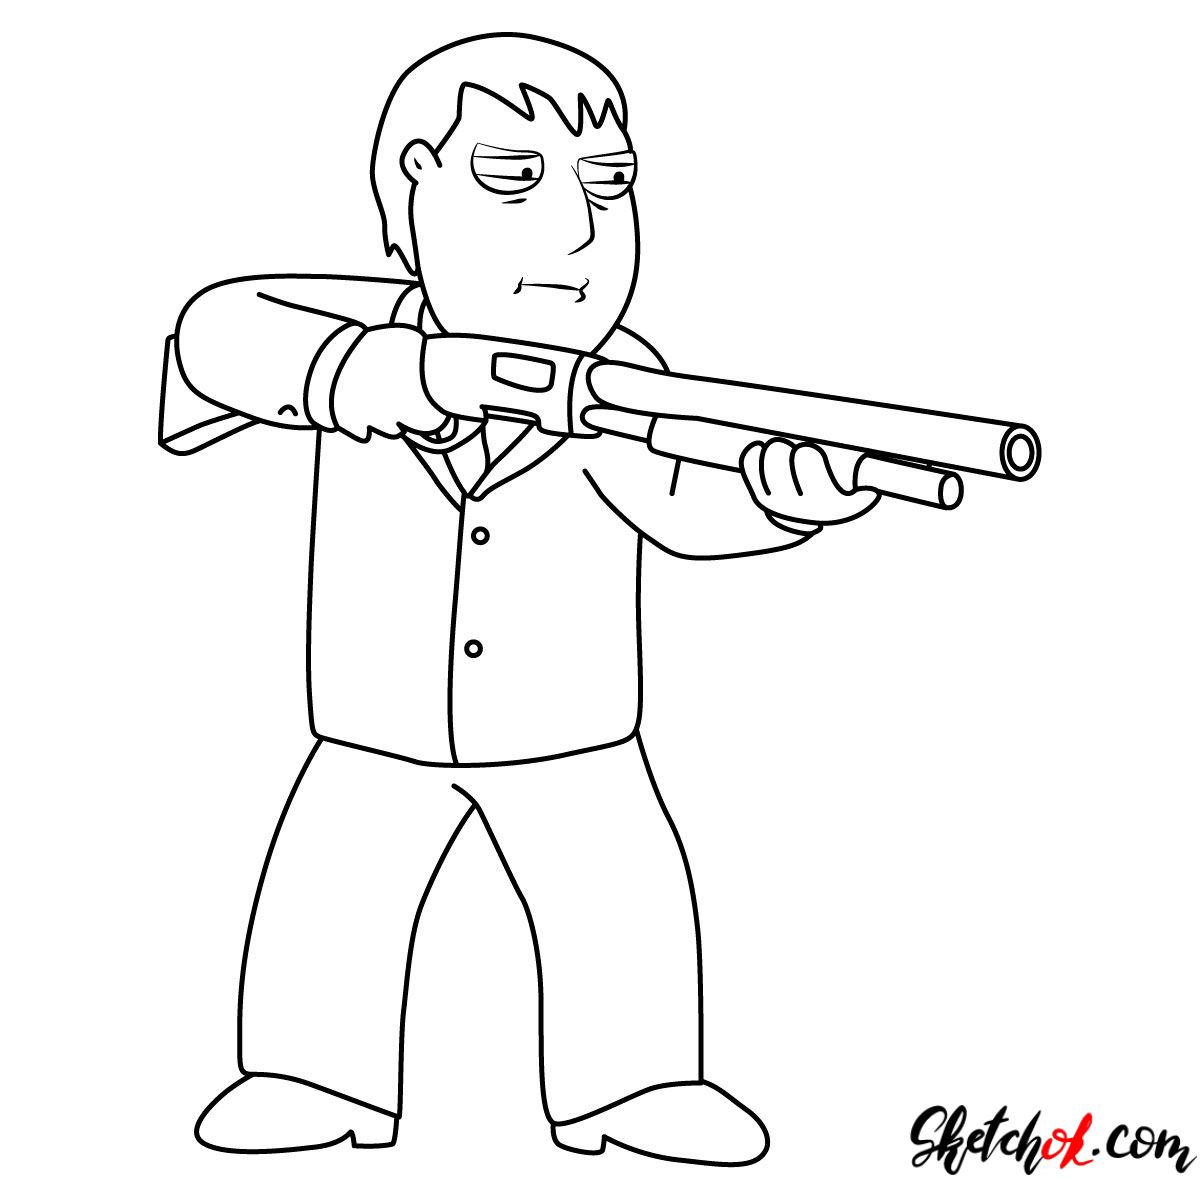 1200x1200 How To Draw Mayor Adam West With A Rifle